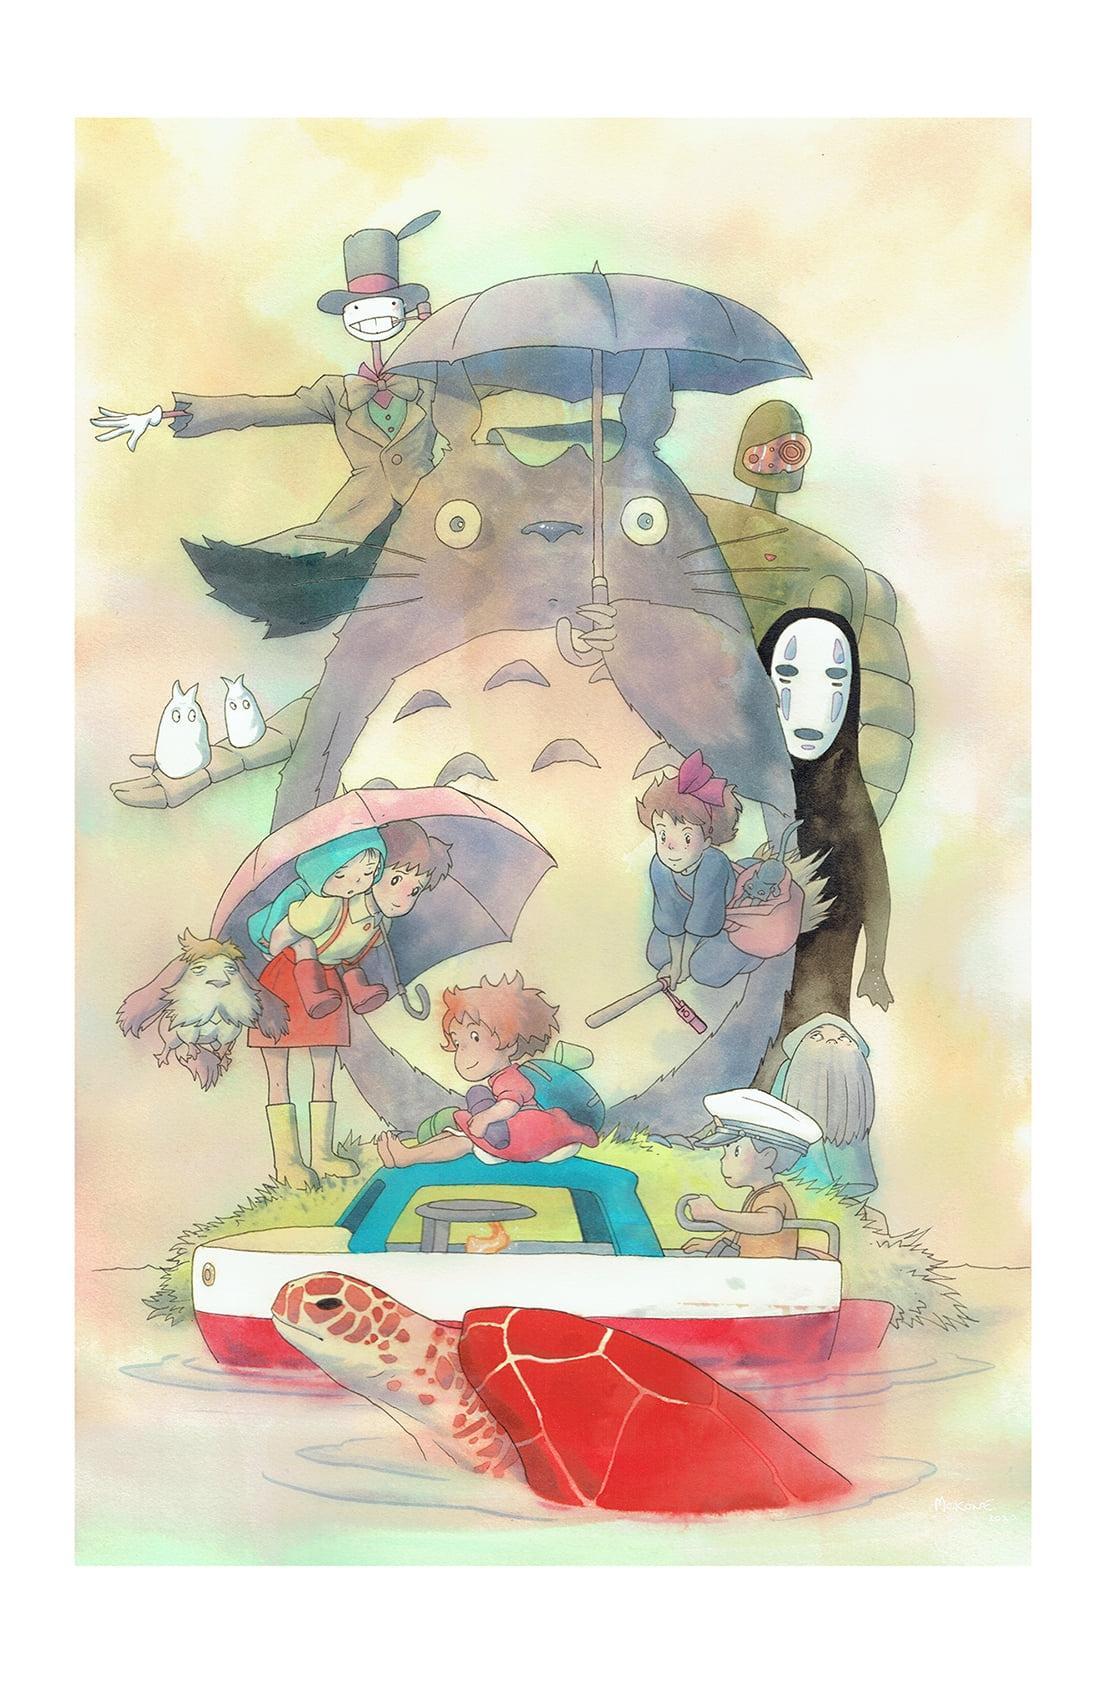 Studio Ghibli Watercolor Commission My Neighbor Totoro Kiki S Delivery Service Spirited Away Ponyo In Tatiana Tdart Dykes S Mike Mckone Comic Art Gallery Room